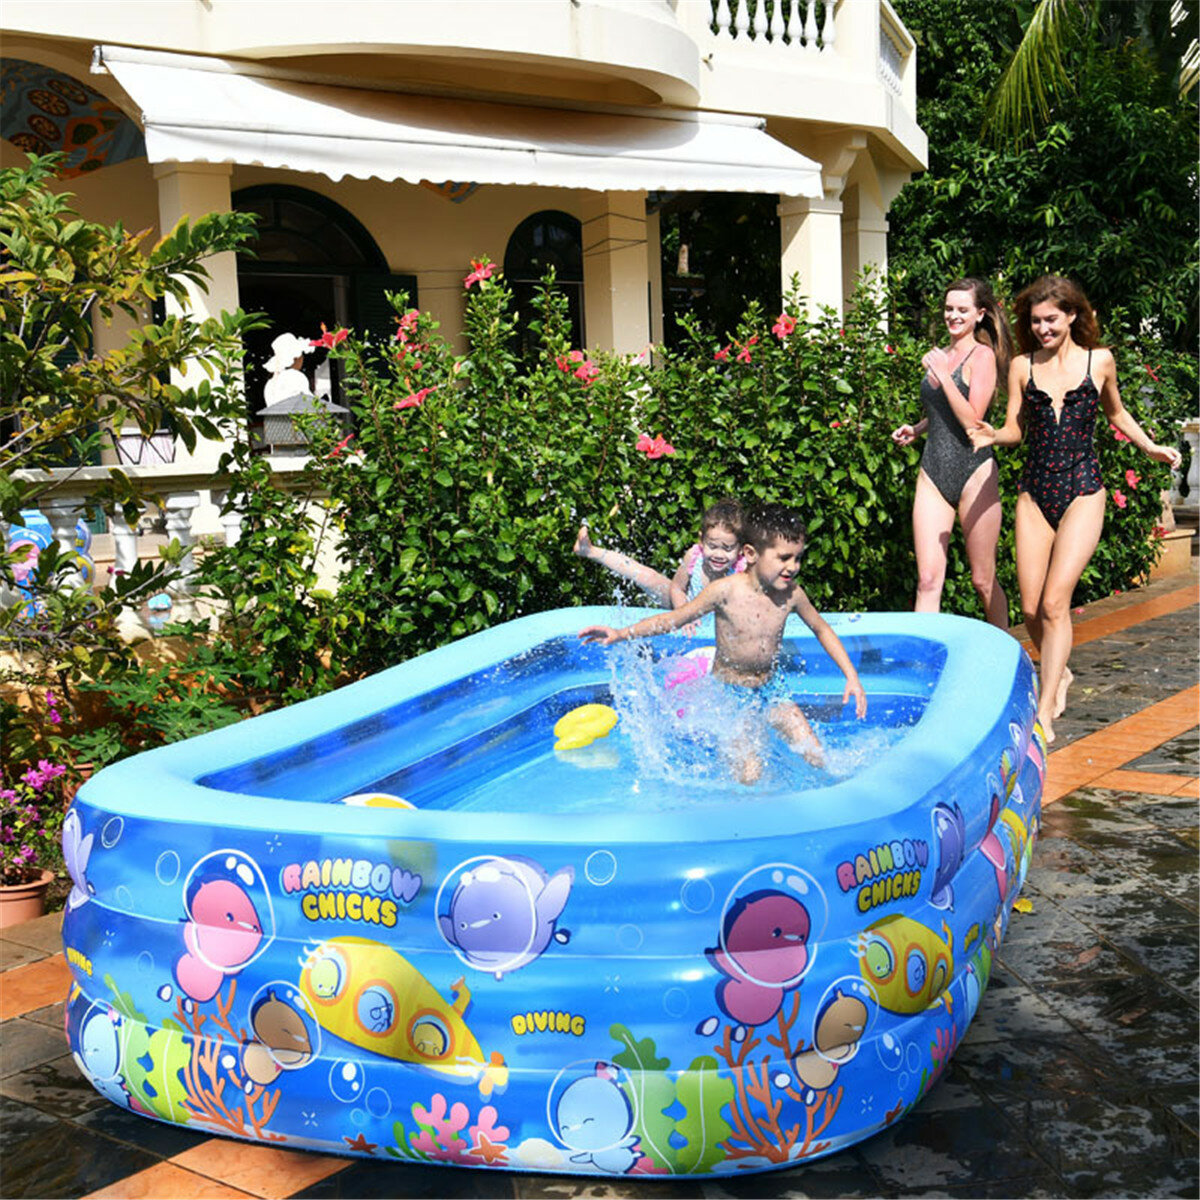 Inflatable Swimming Pool Children Family Pool Adult Paddling Pool Cartoon Chick Rainbow Pool